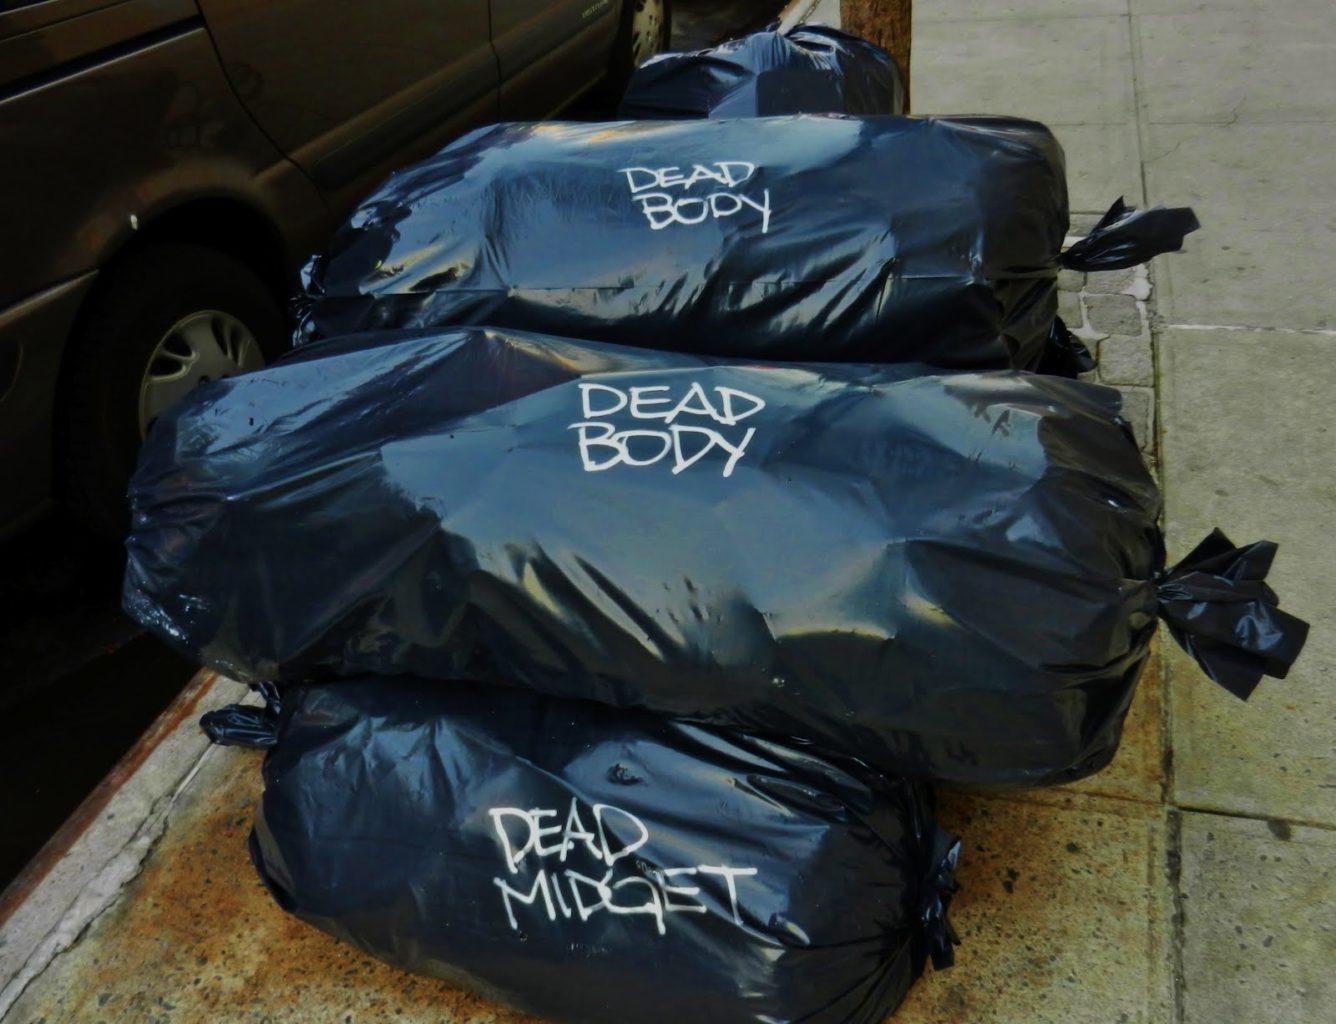 «Готовят мешки для трупов» – Казнет обсуждает вирусное видео